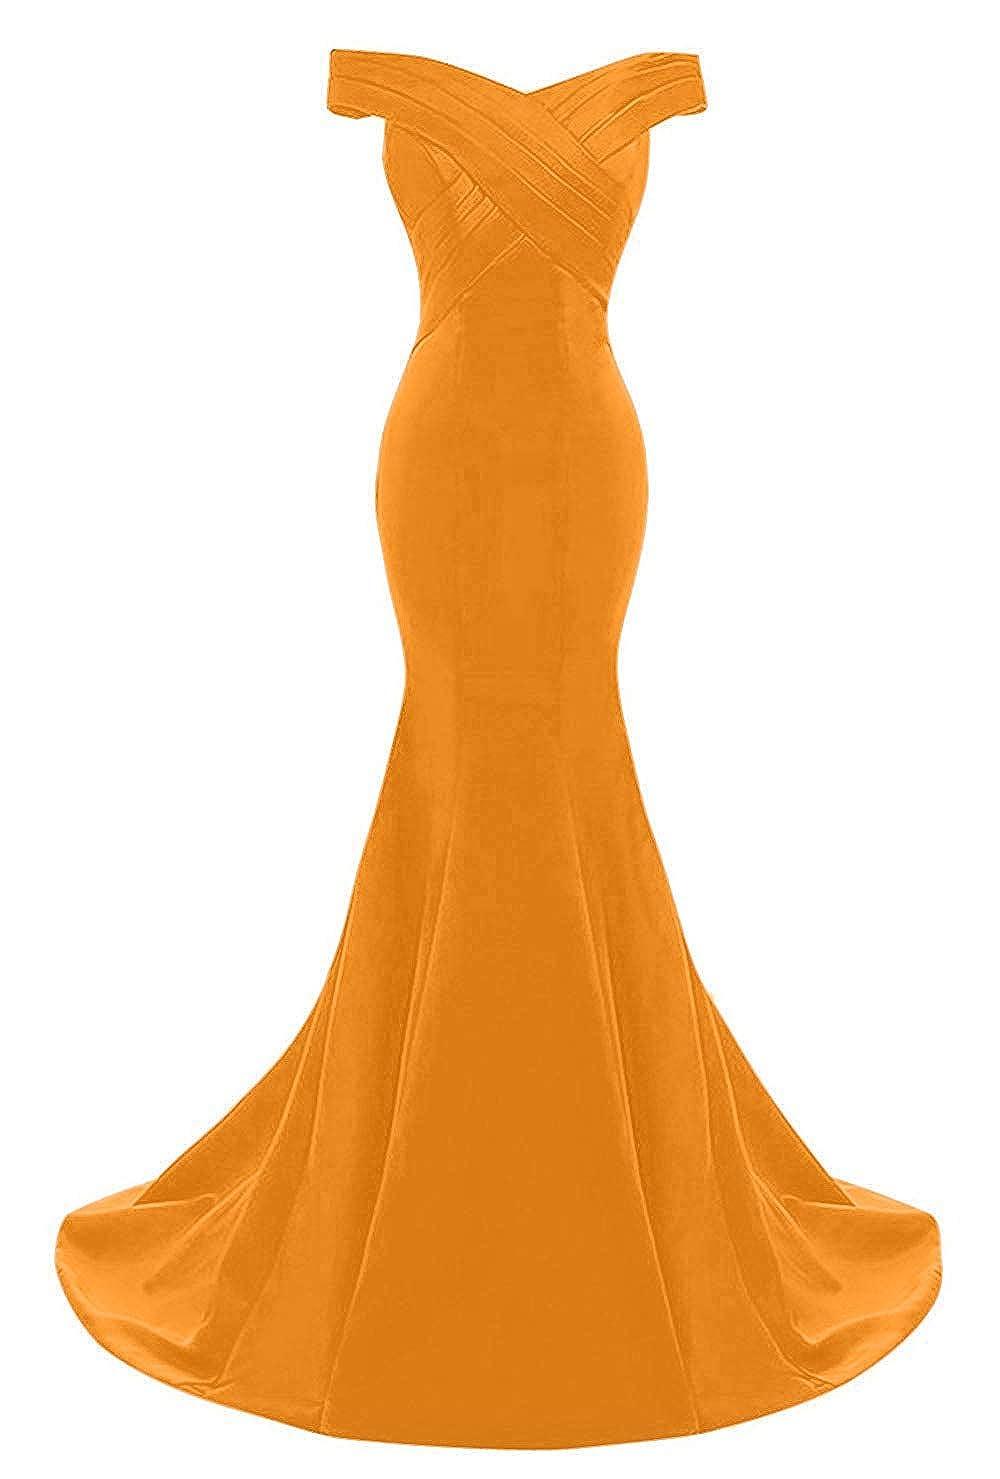 orange Monalia Women's Elegant Mermaid Dress Long Off Shoulder Prom Evening Gown